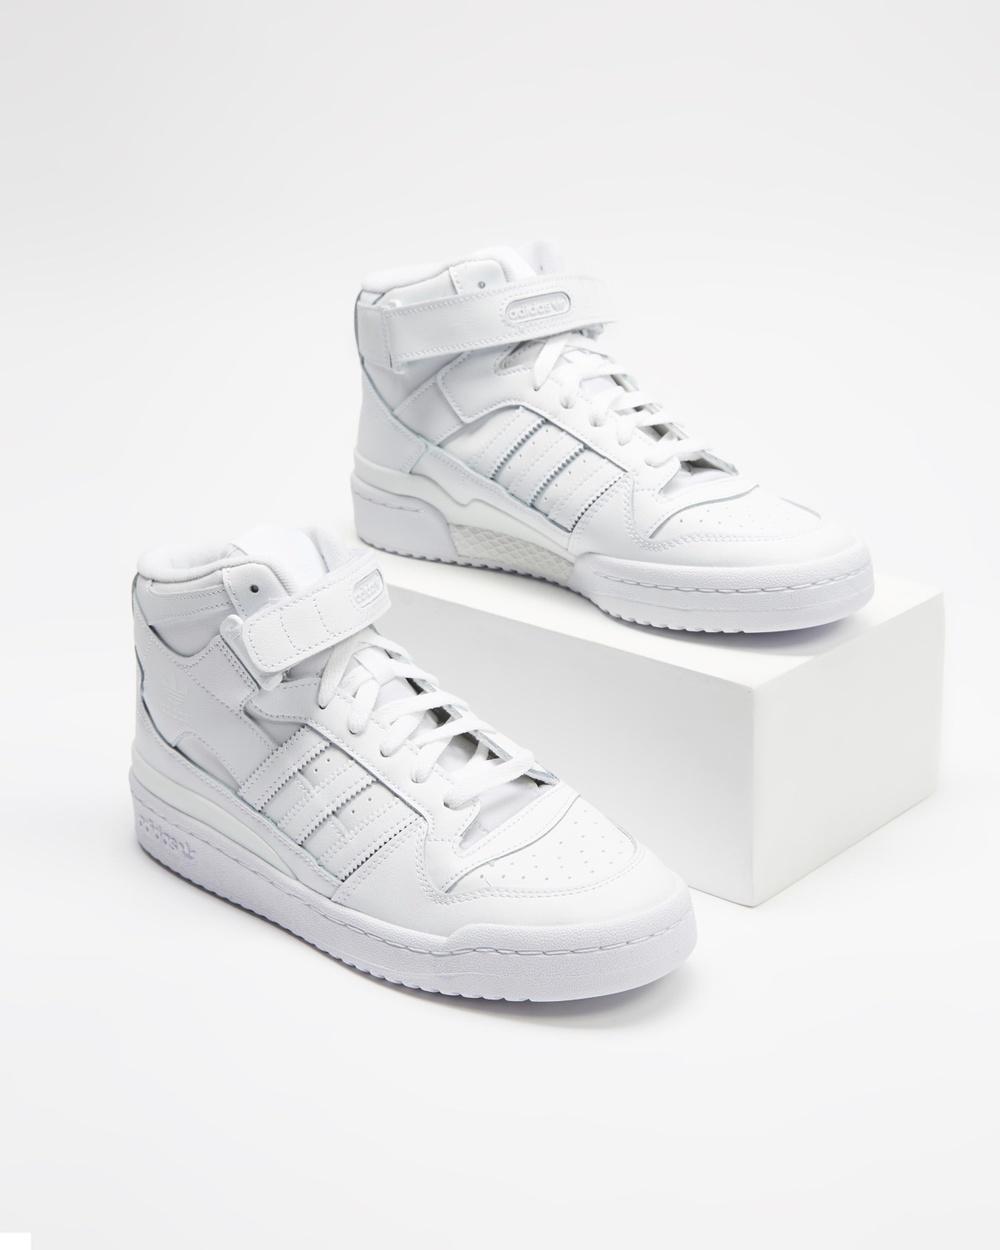 adidas Originals Forum Mid Shoes Unisex Lifestyle Sneakers Cloud White, Cloud White & White